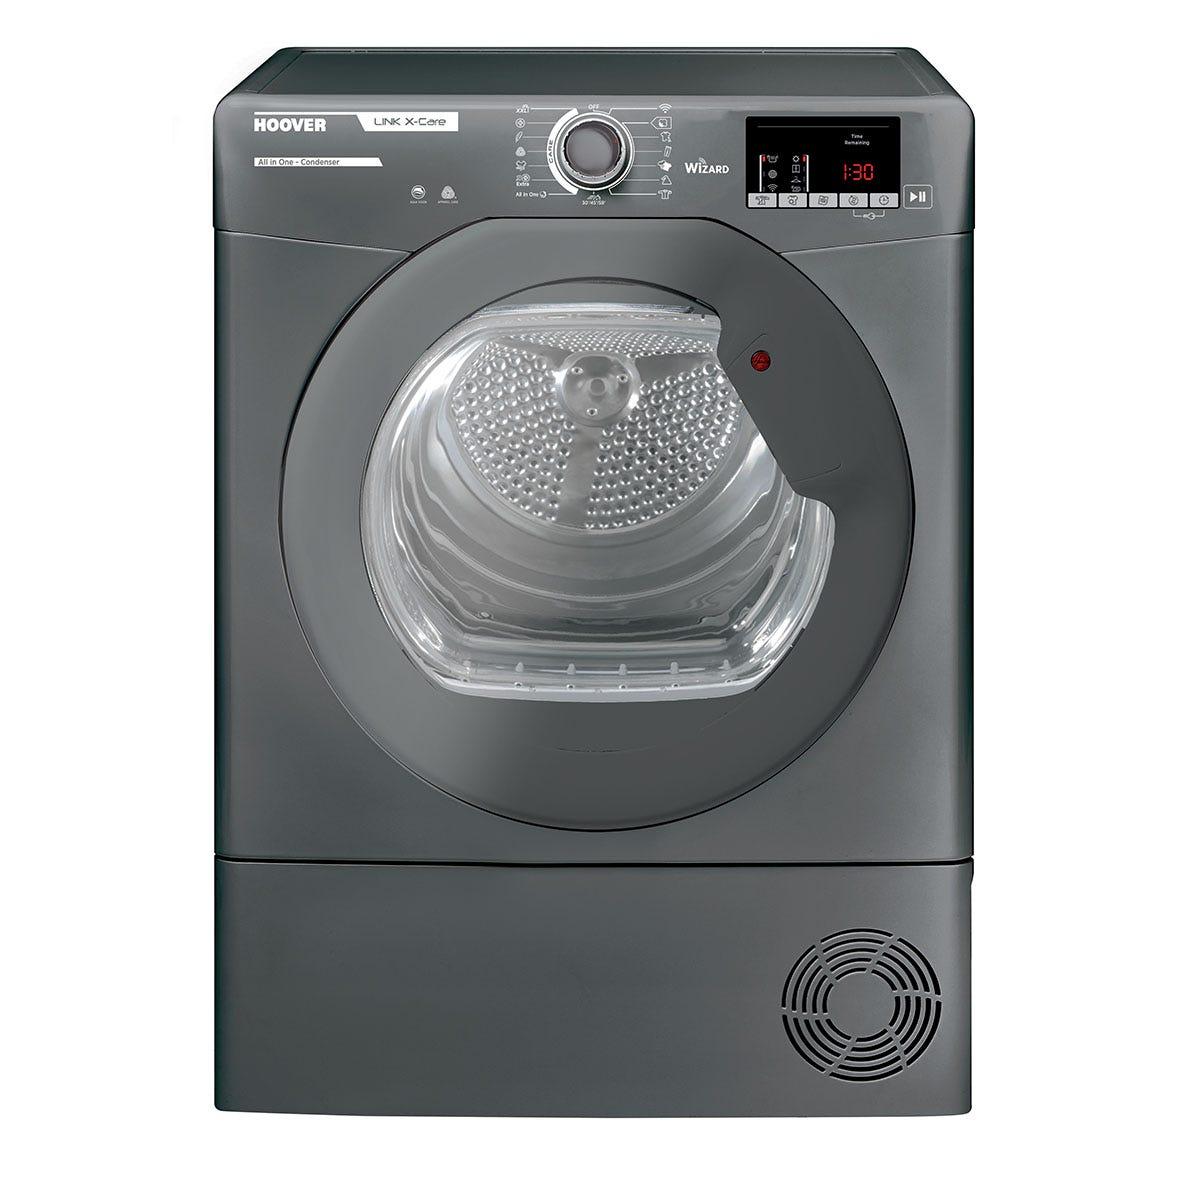 Hoover HLXC10DRGR 10kg Smart Wifi-enabled Condenser Tumble Dryer - Graphite